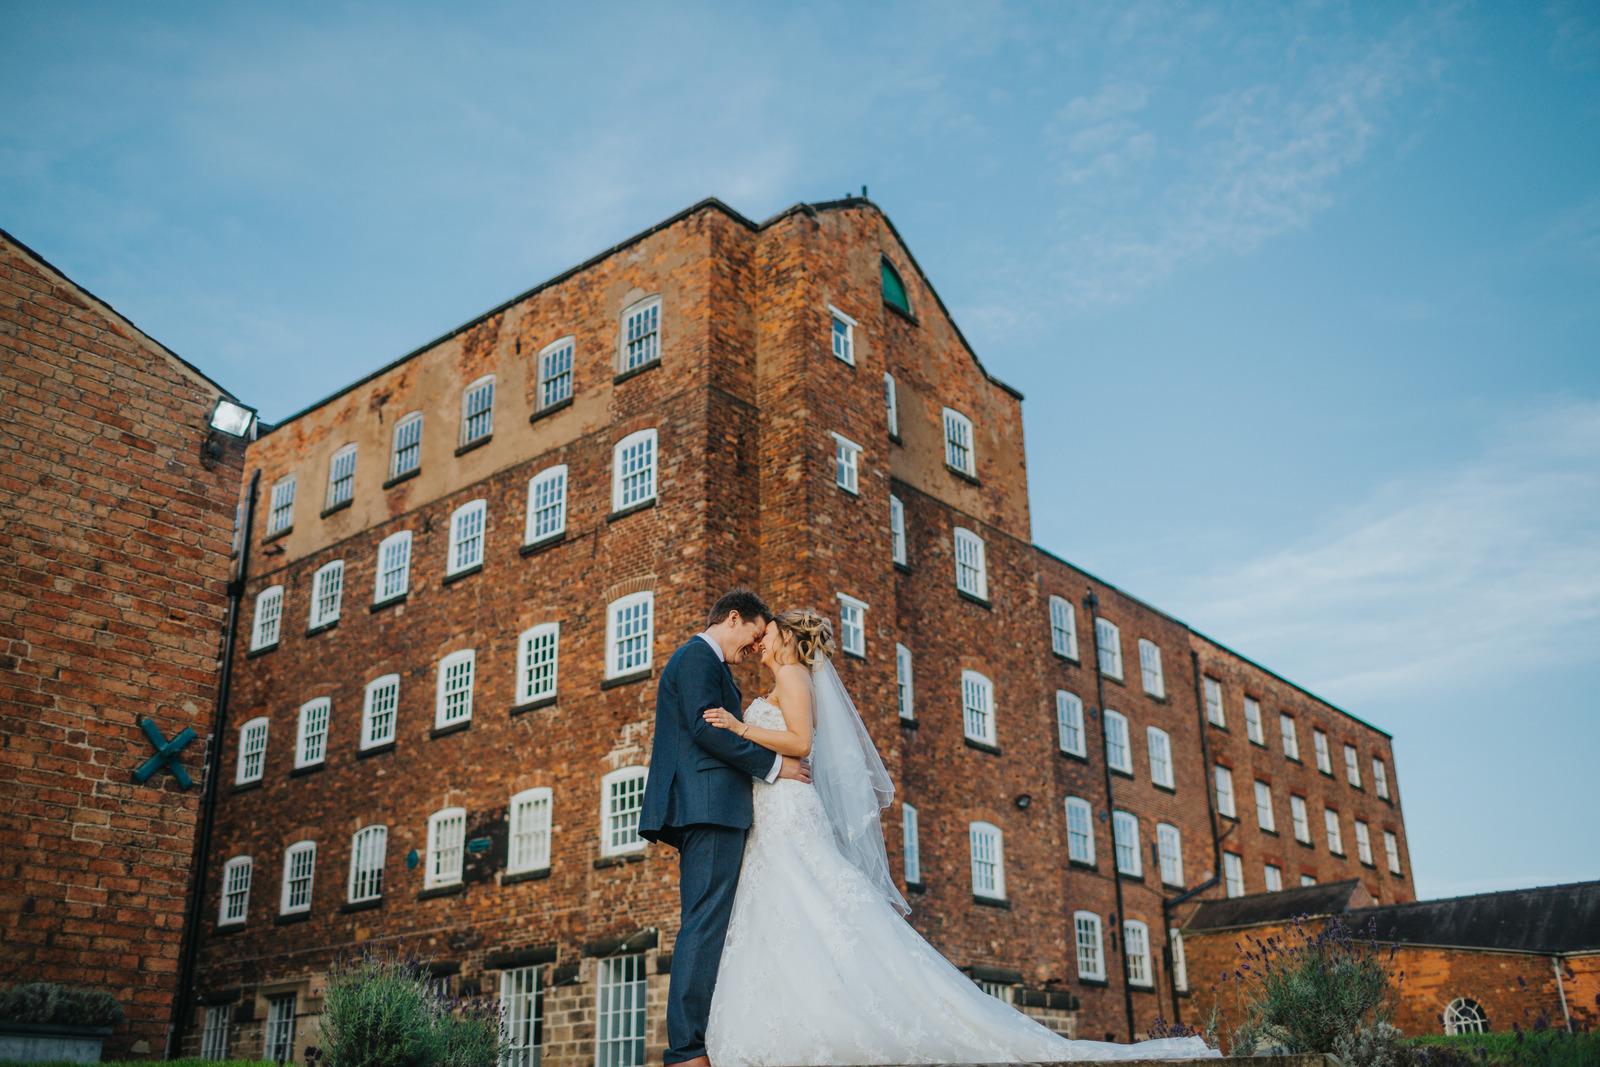 50-Chloe & Tom Wedding-663.jpg